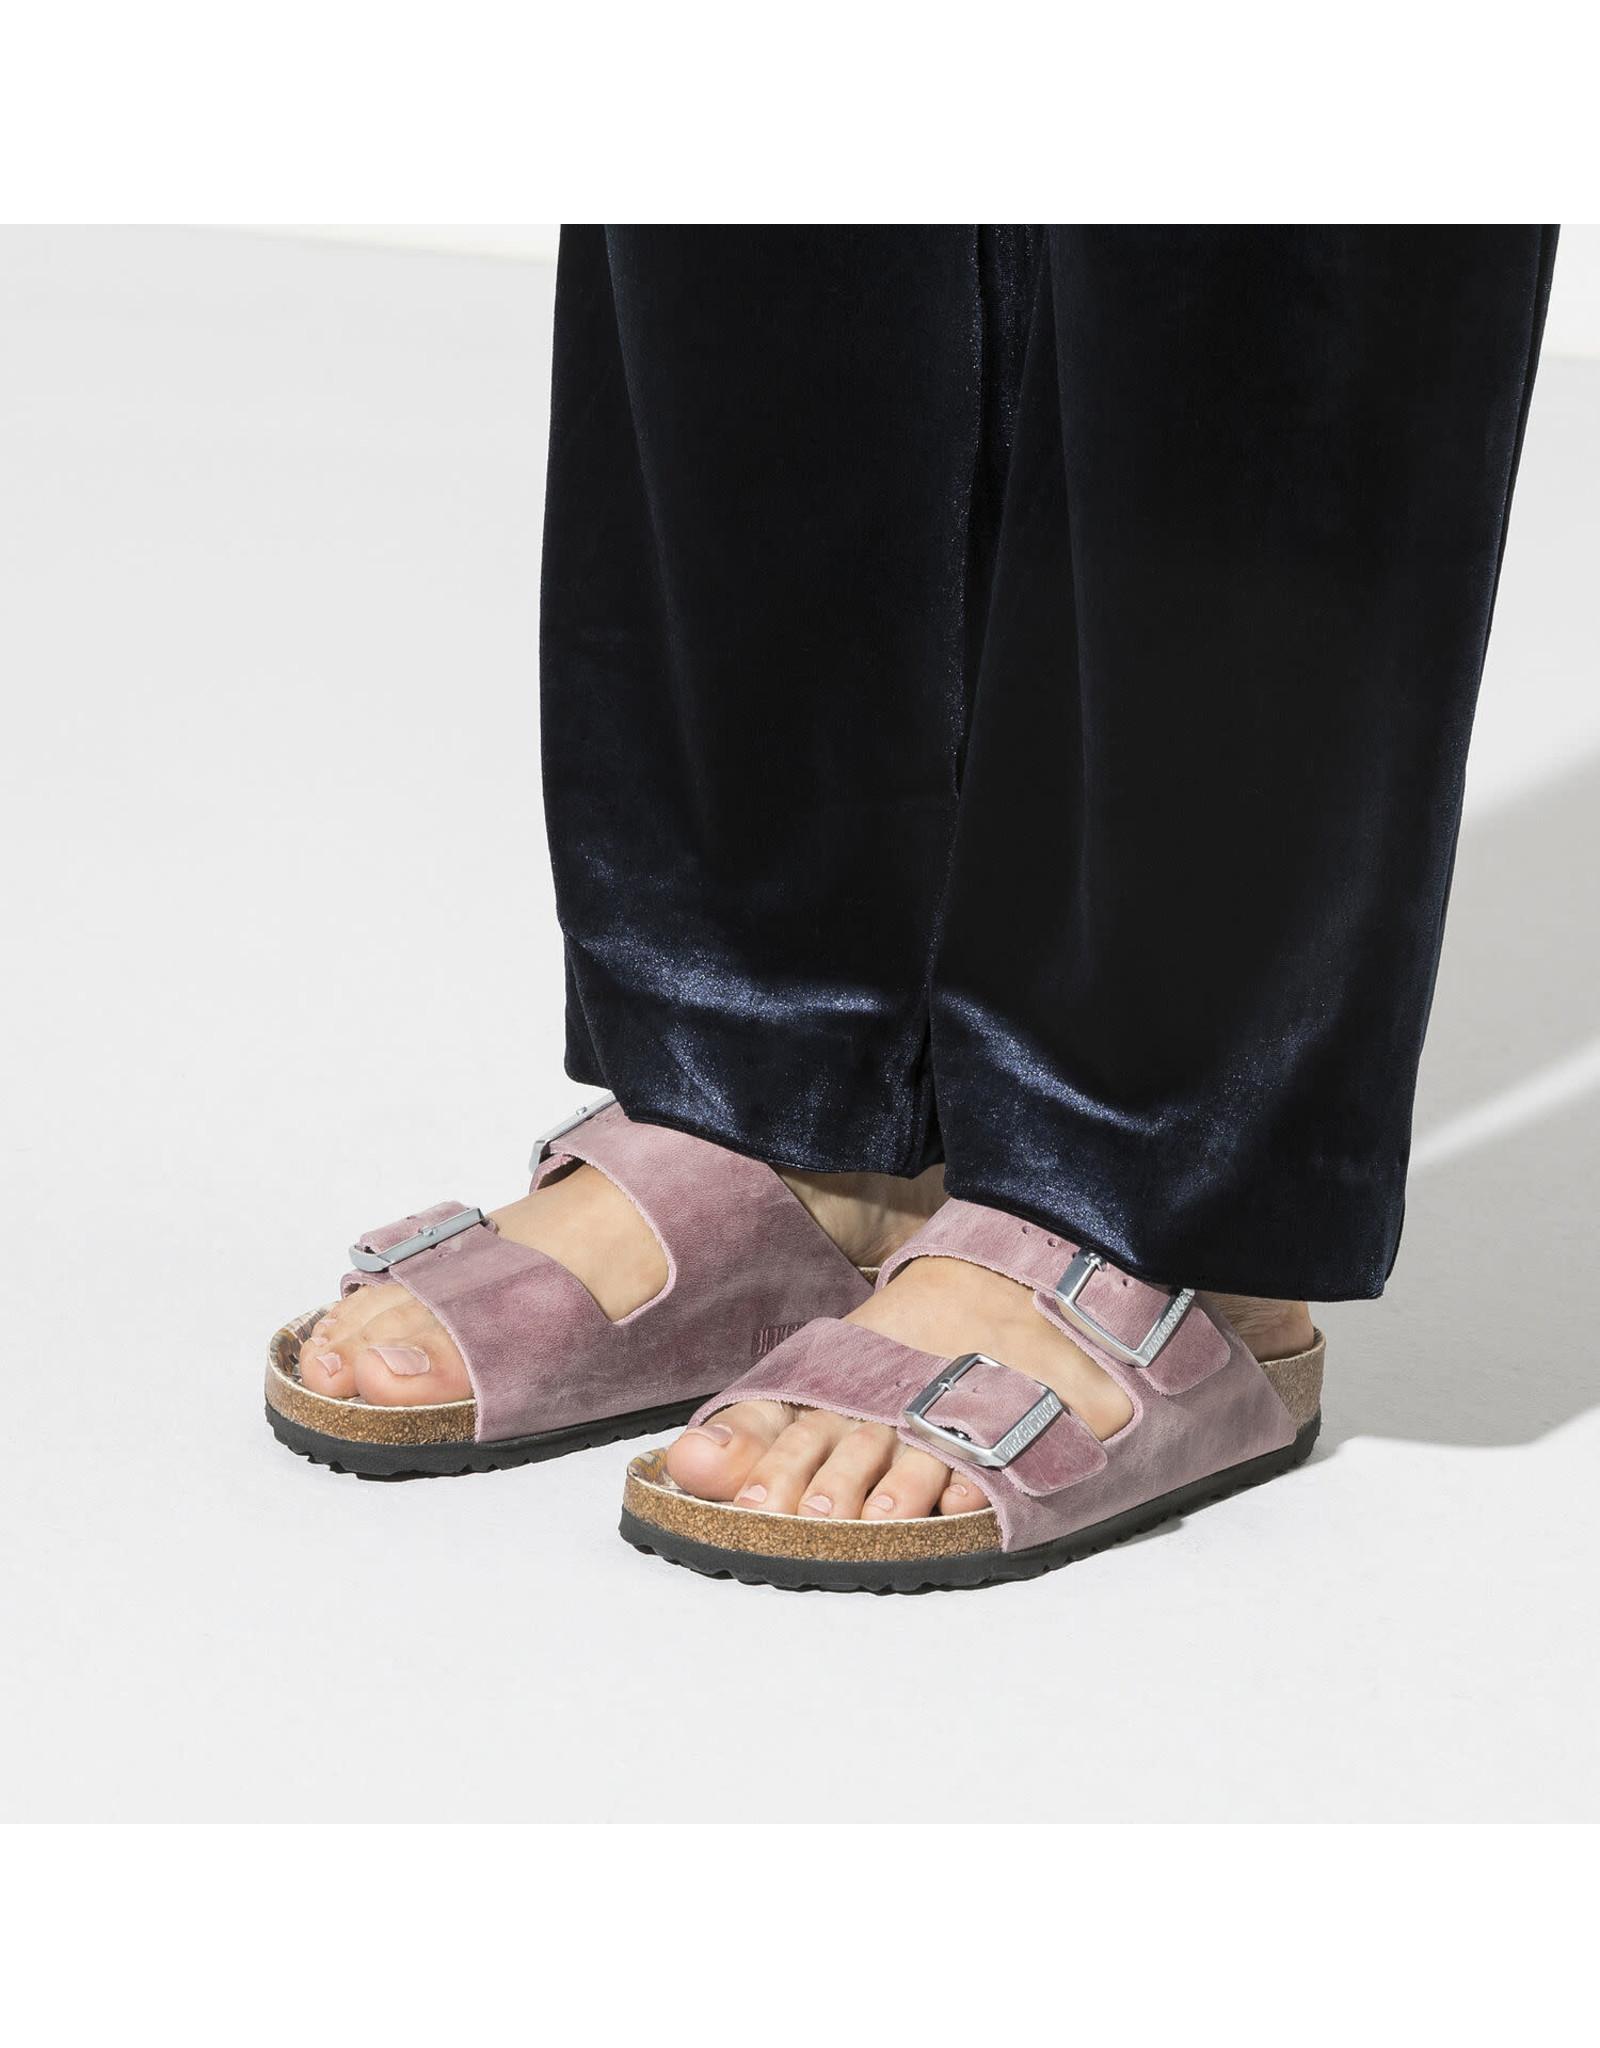 Birkenstock Arizona Leather Sandal